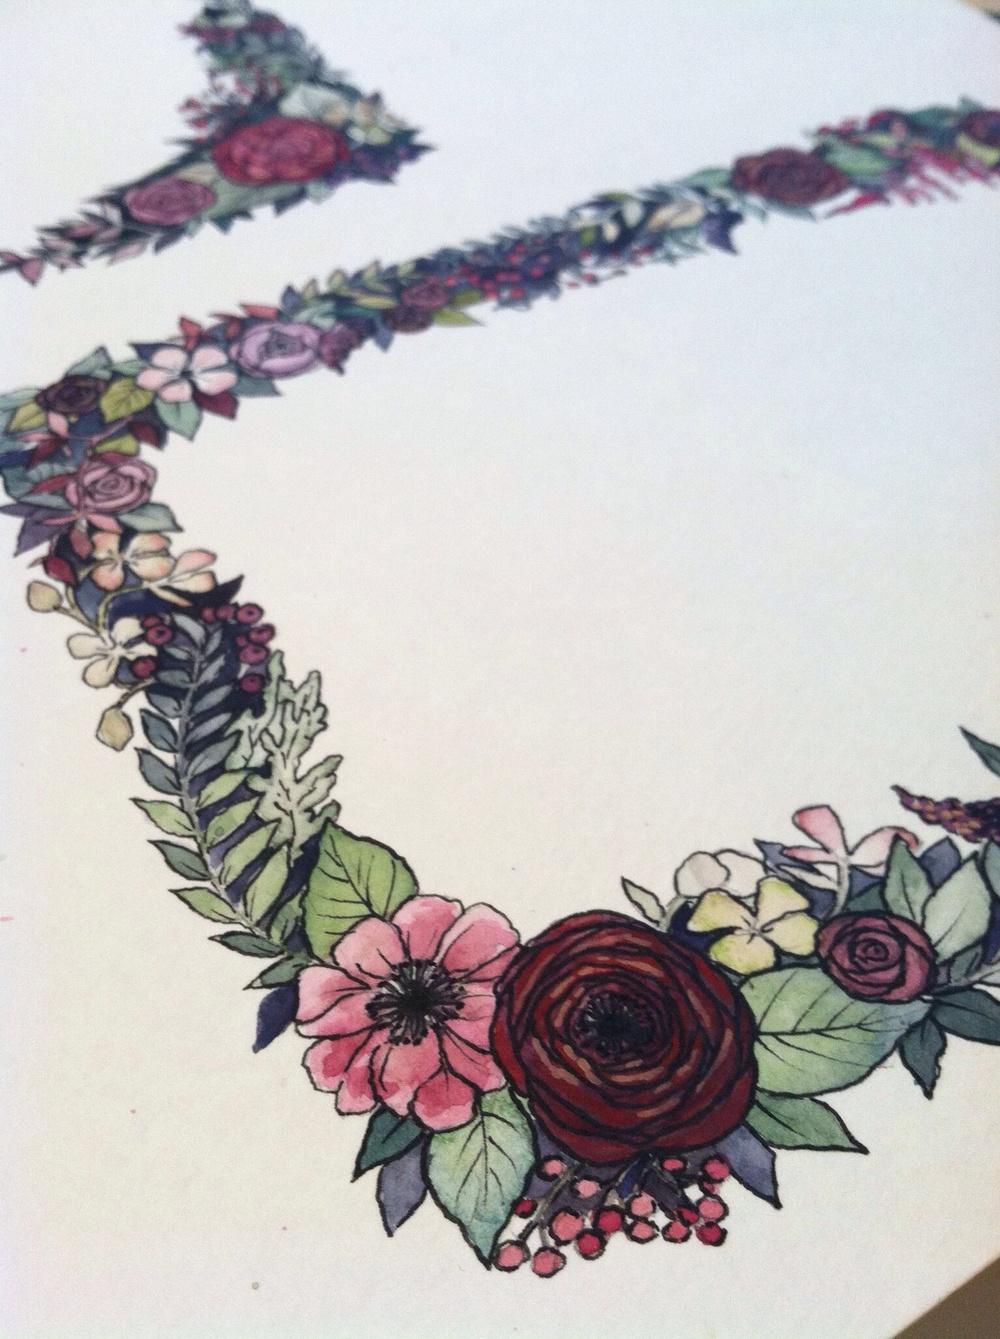 by Jeni Kubicek for Elisabeth Rose